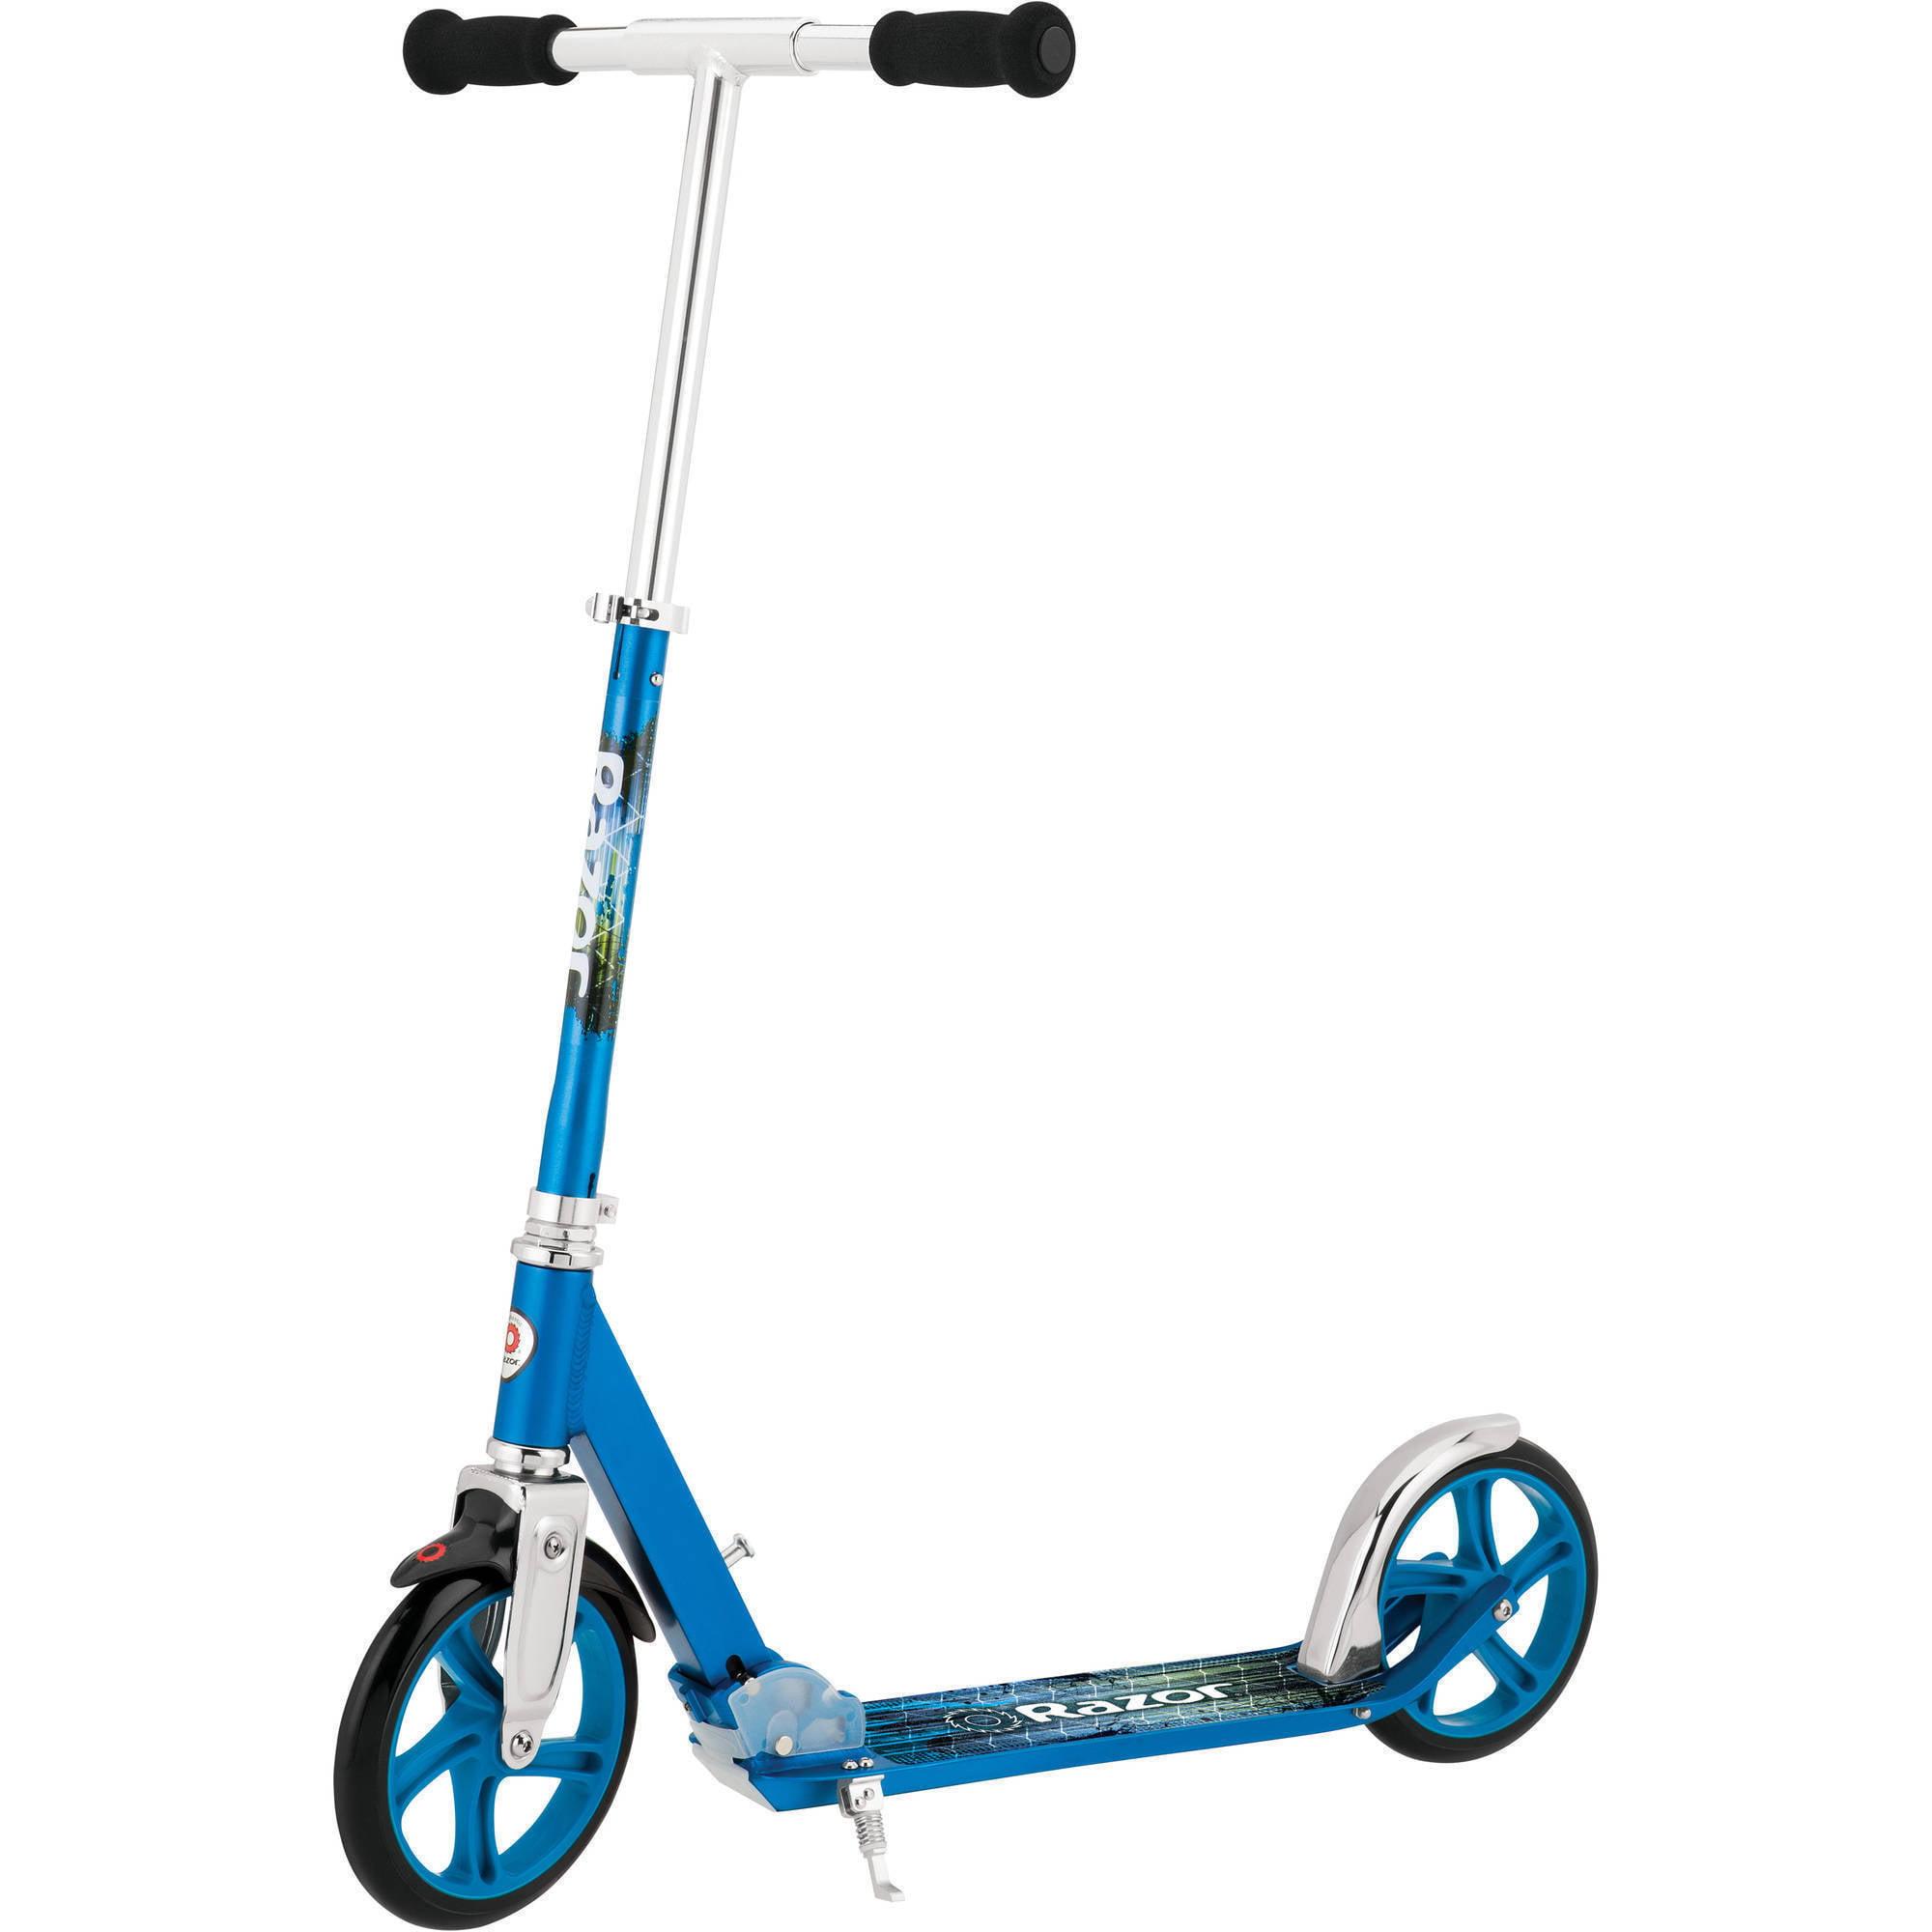 razor a5 lux scooter - walmart